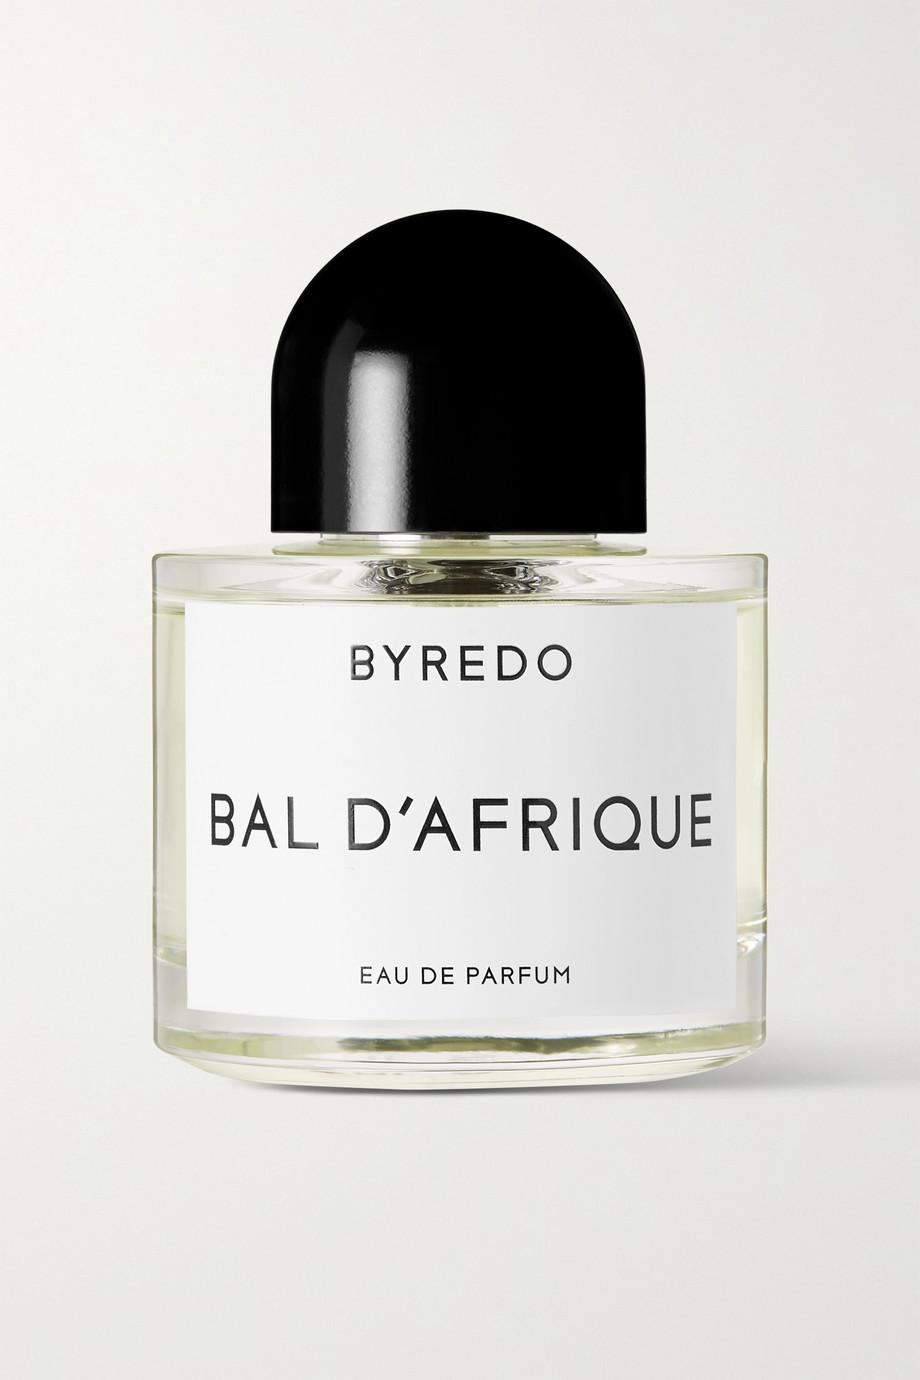 Bal D'afrique Eau De Parfum - Neroli & Cedar Wood, 50ml, by Byredo